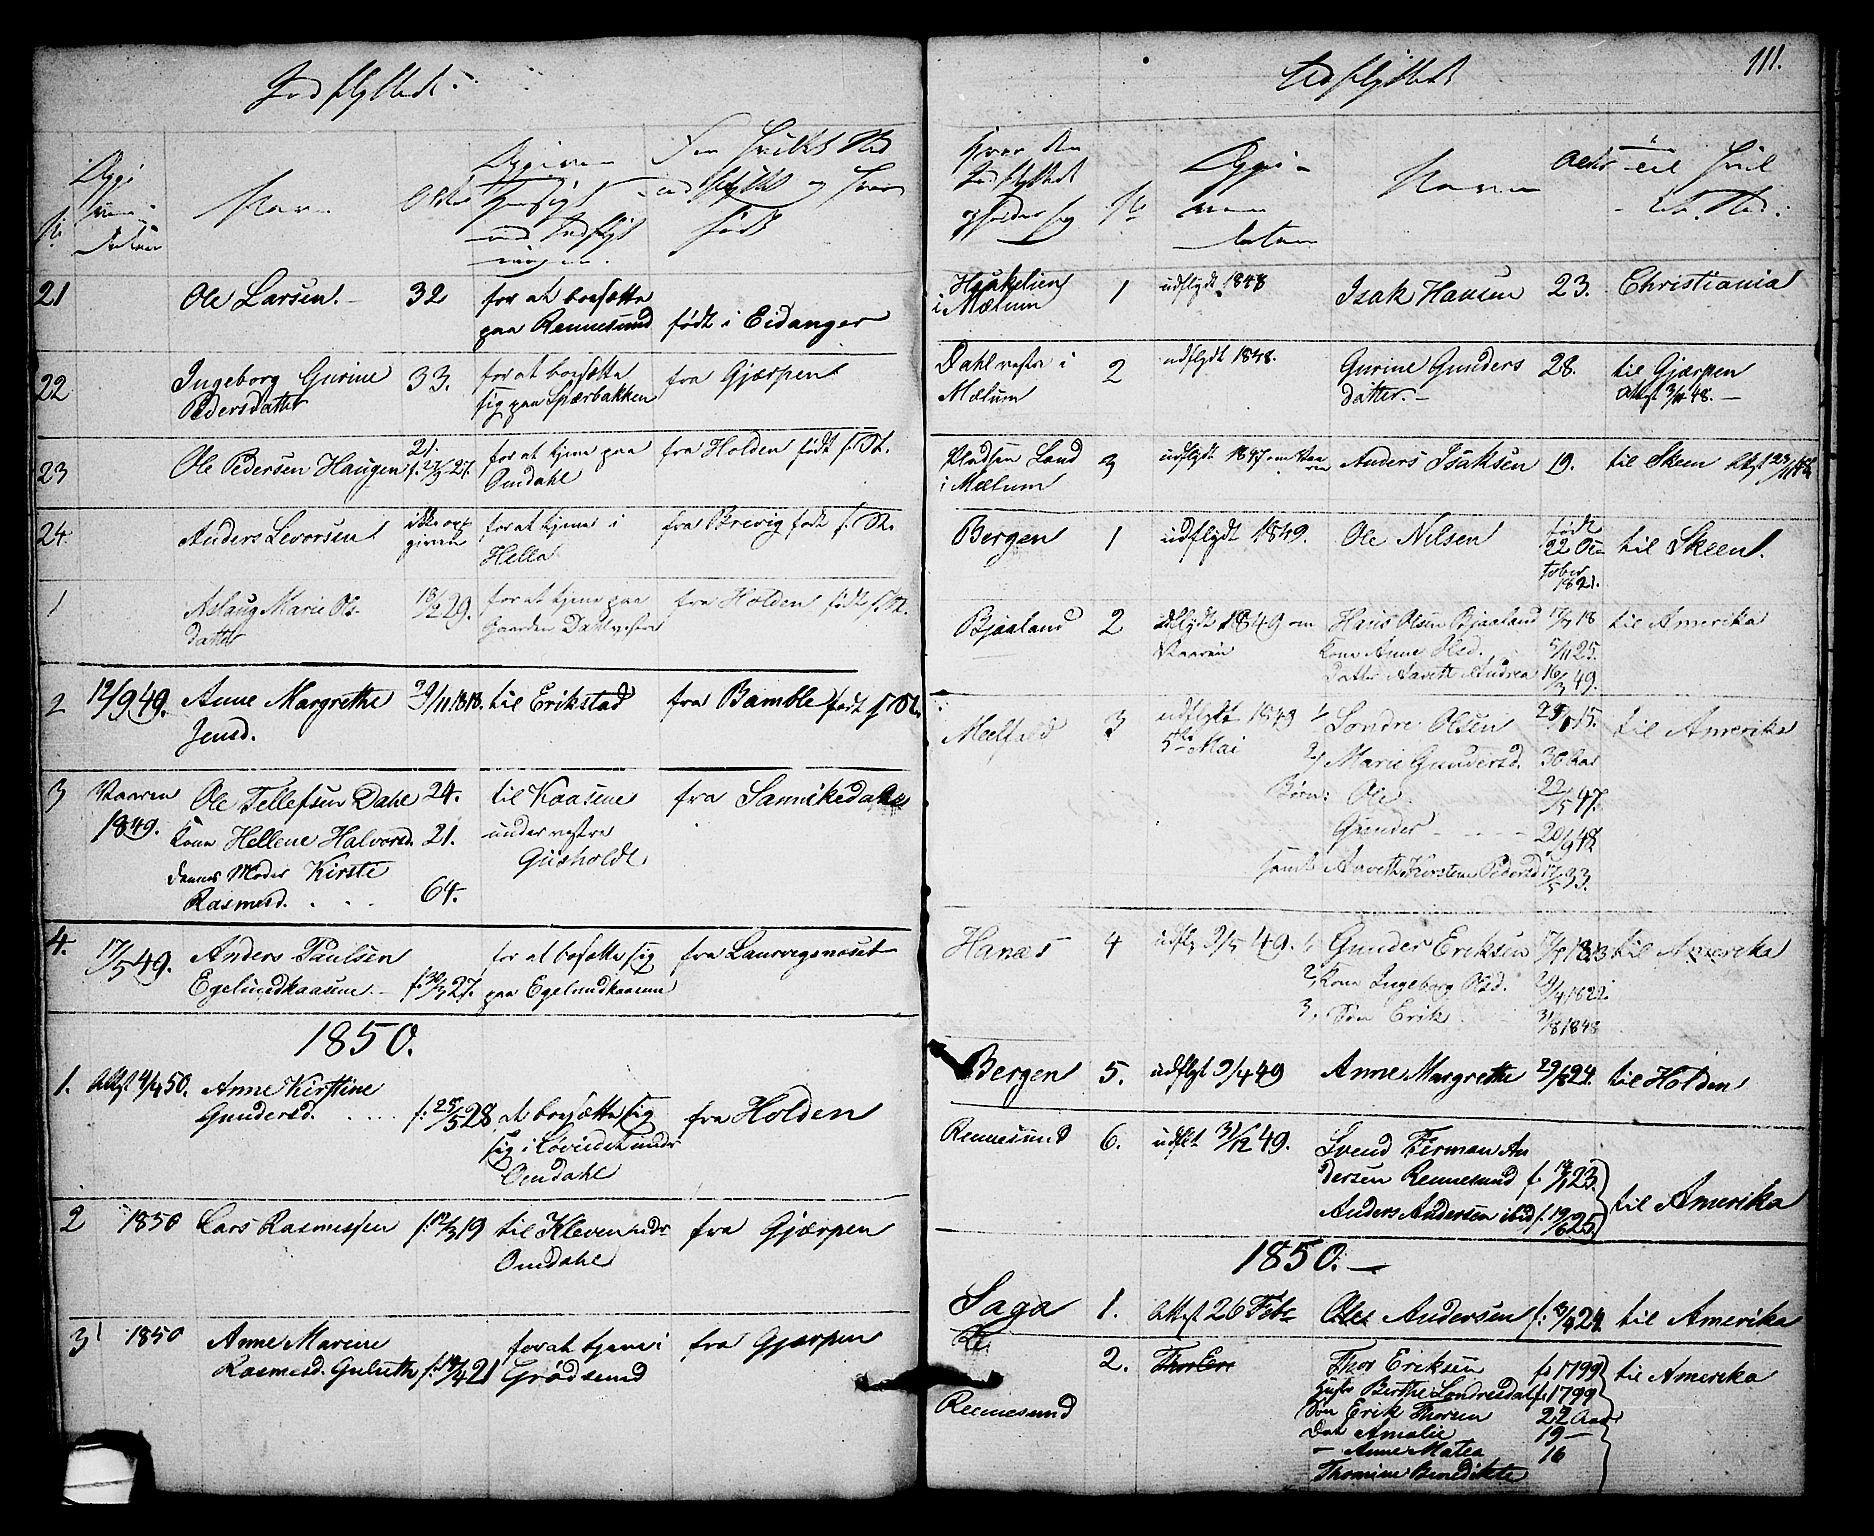 SAKO, Solum kirkebøker, G/Gb/L0001: Klokkerbok nr. II 1, 1848-1859, s. 111